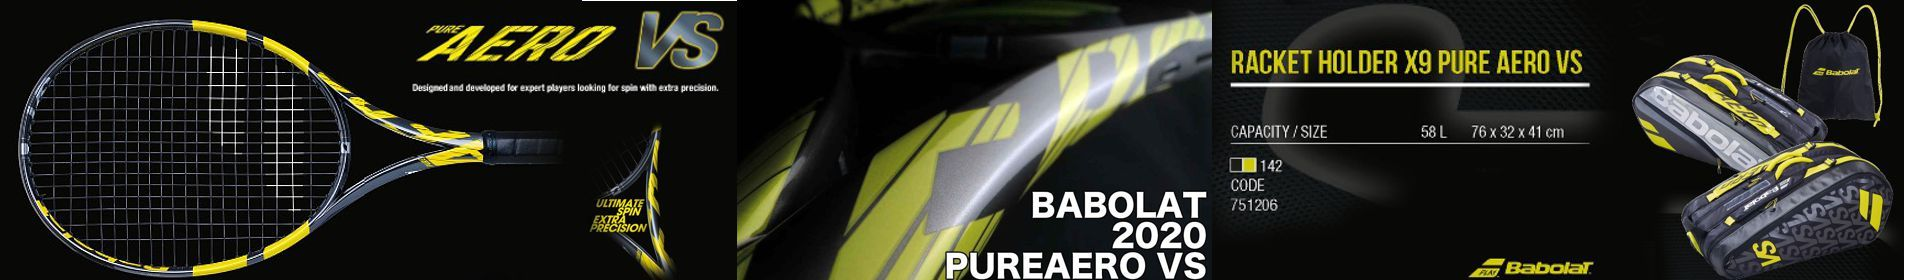 Babolat Pure Aero VS 2020